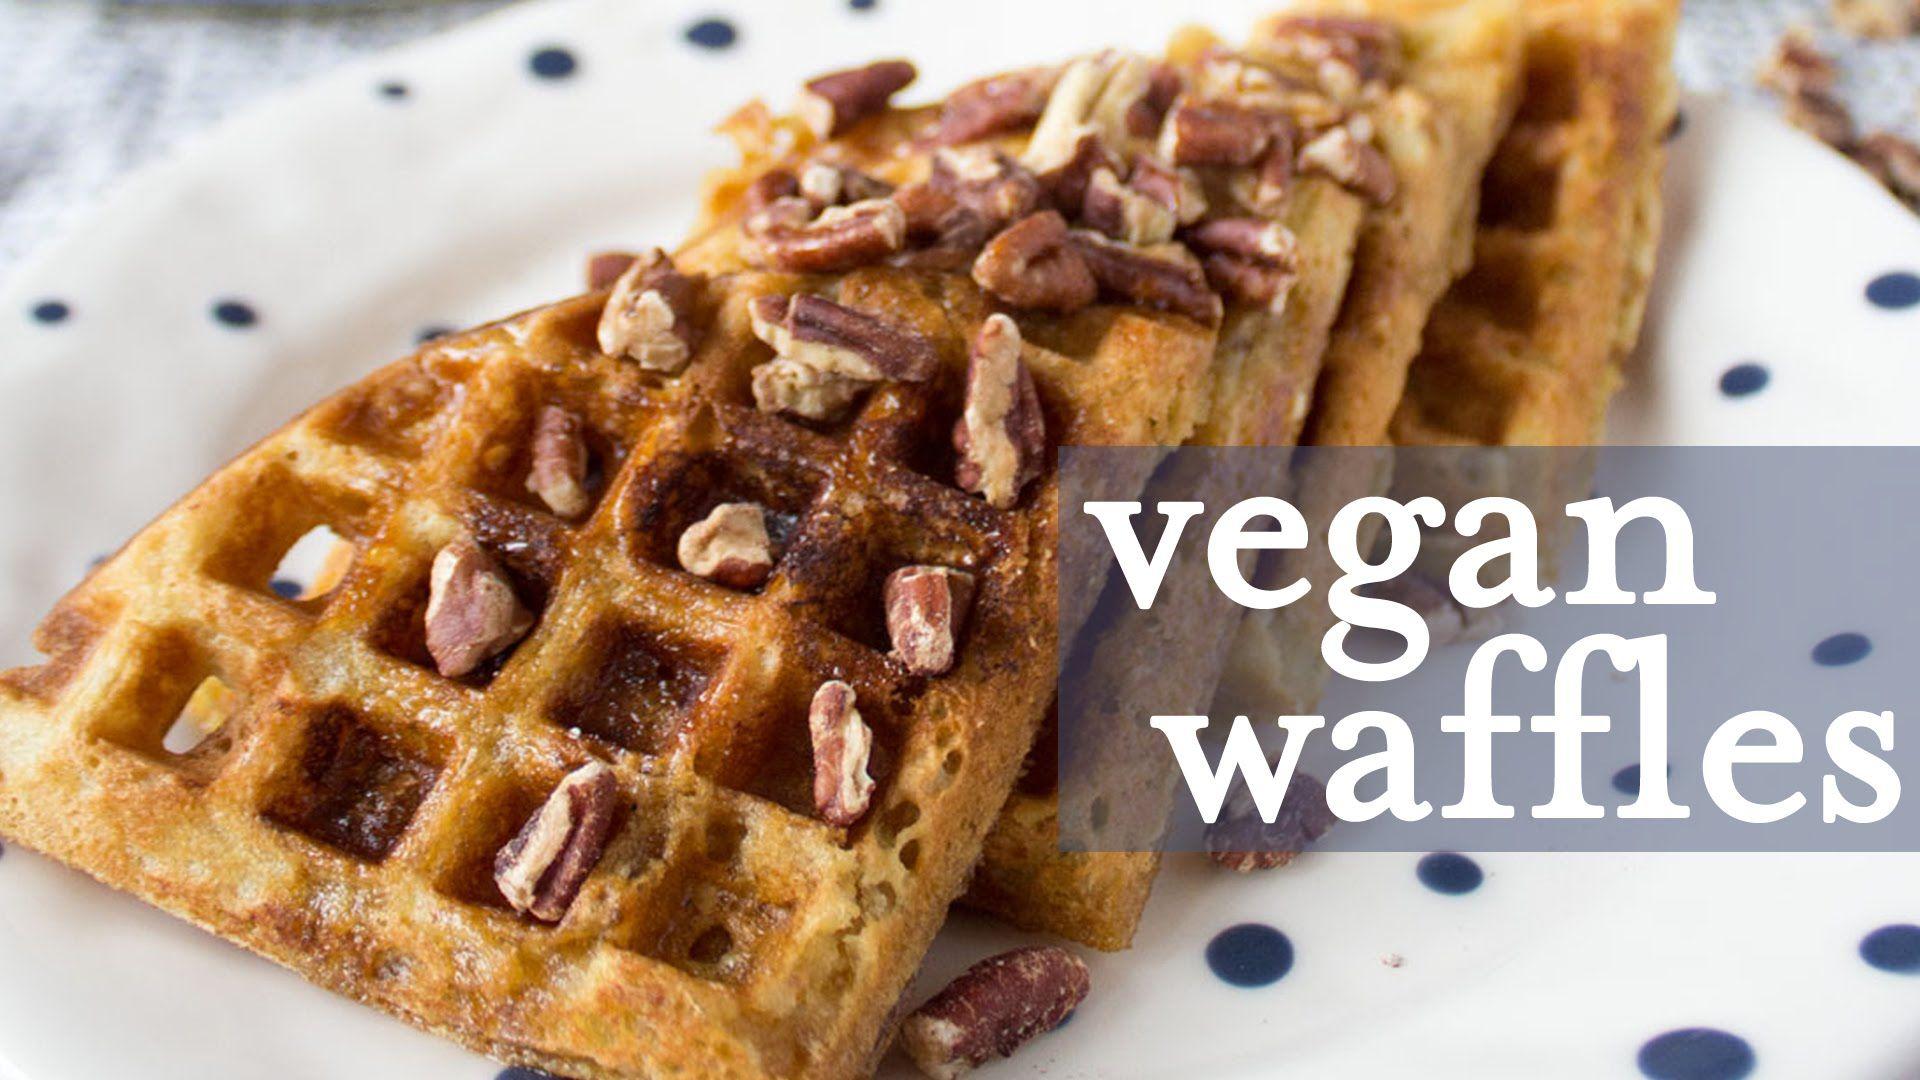 Vegan Buttermilk Waffles Vegan Soul Food Buttermilk Waffles Recipes Food